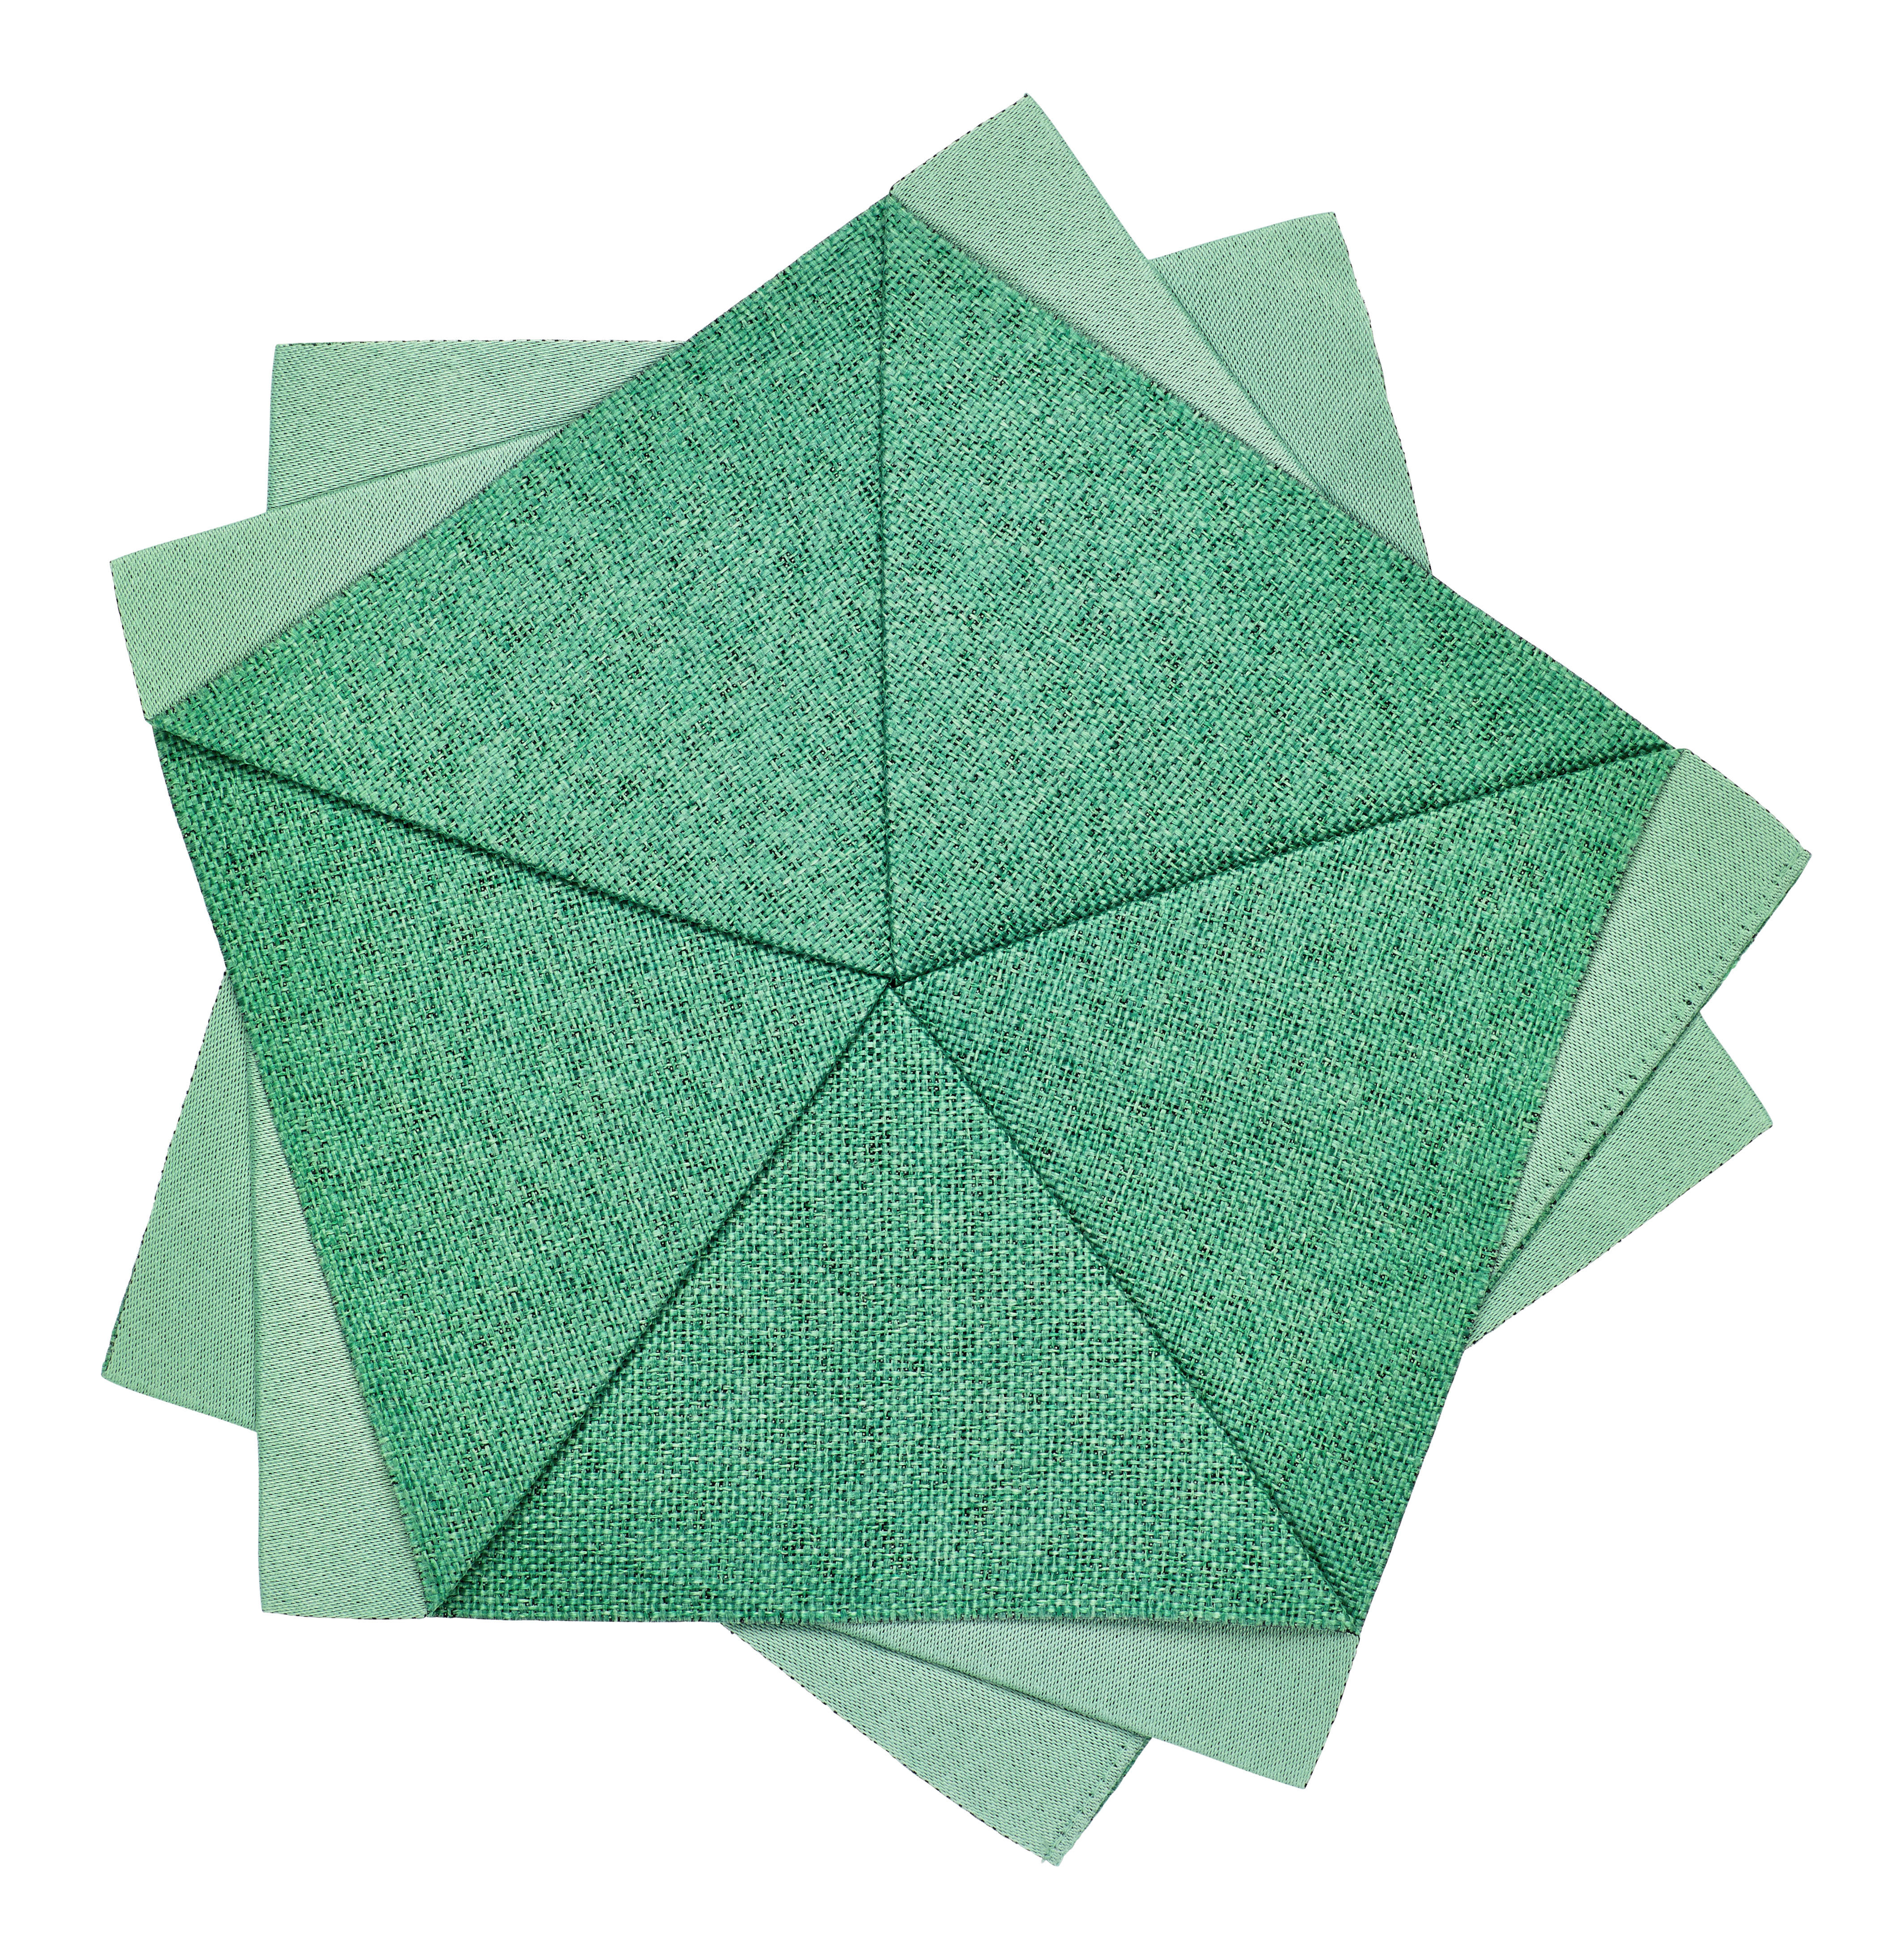 Tableware - Napkins & Tablecloths - Iittala X Issey Miyake Decoration - Table flower - Ø 20 cm by Iittala - Emerald - Polyester